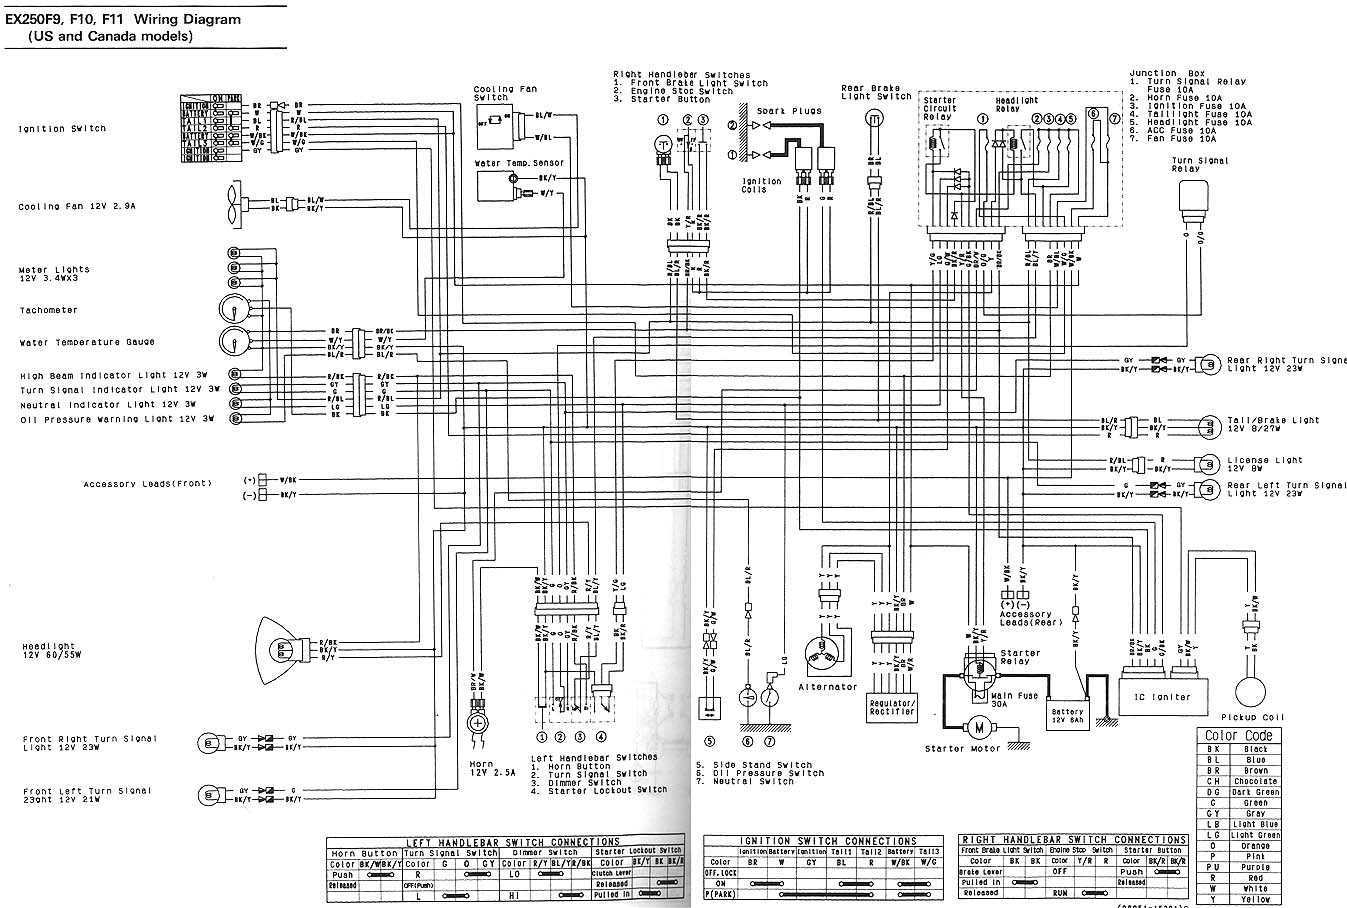 Ninja 250 Wiring Diagram - Ignition Switch Wiring Diagram On Polaris for Wiring  Diagram SchematicsWiring Diagram Schematics